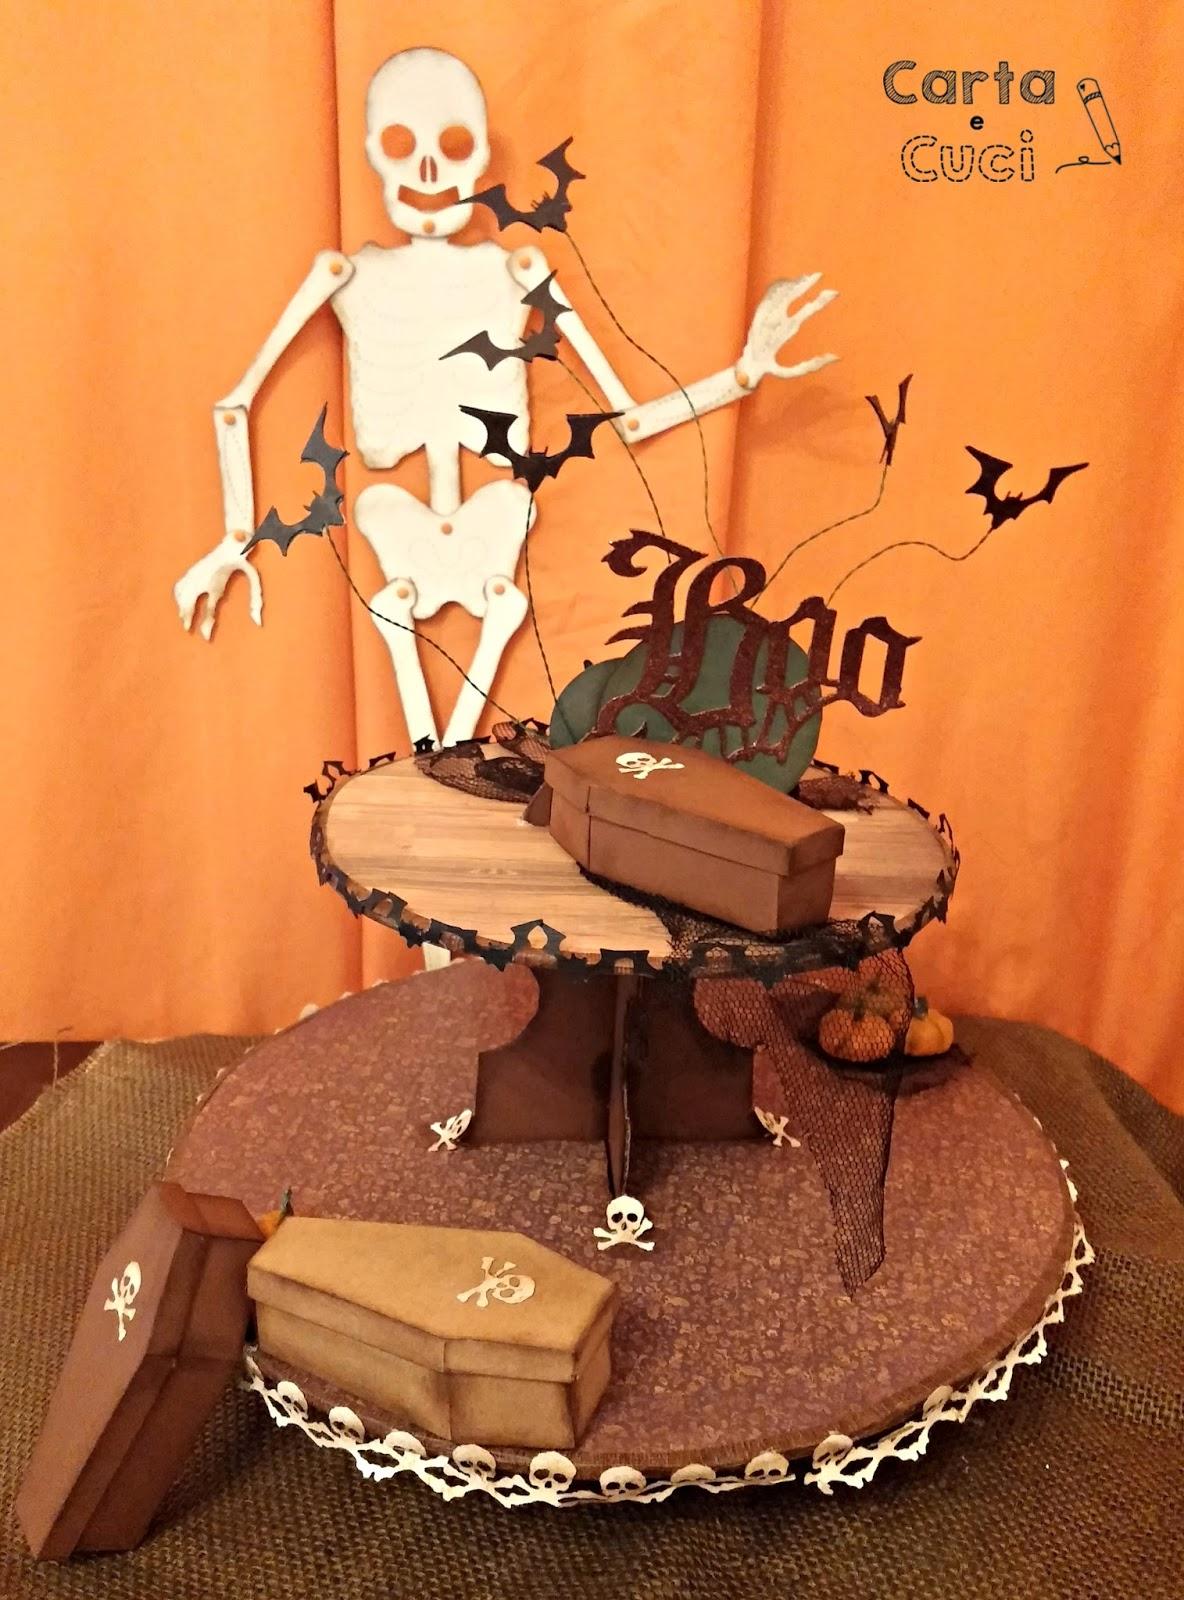 Carta e Cuci: Boo (L'Alzatina per i Dolcetti di Halloween)